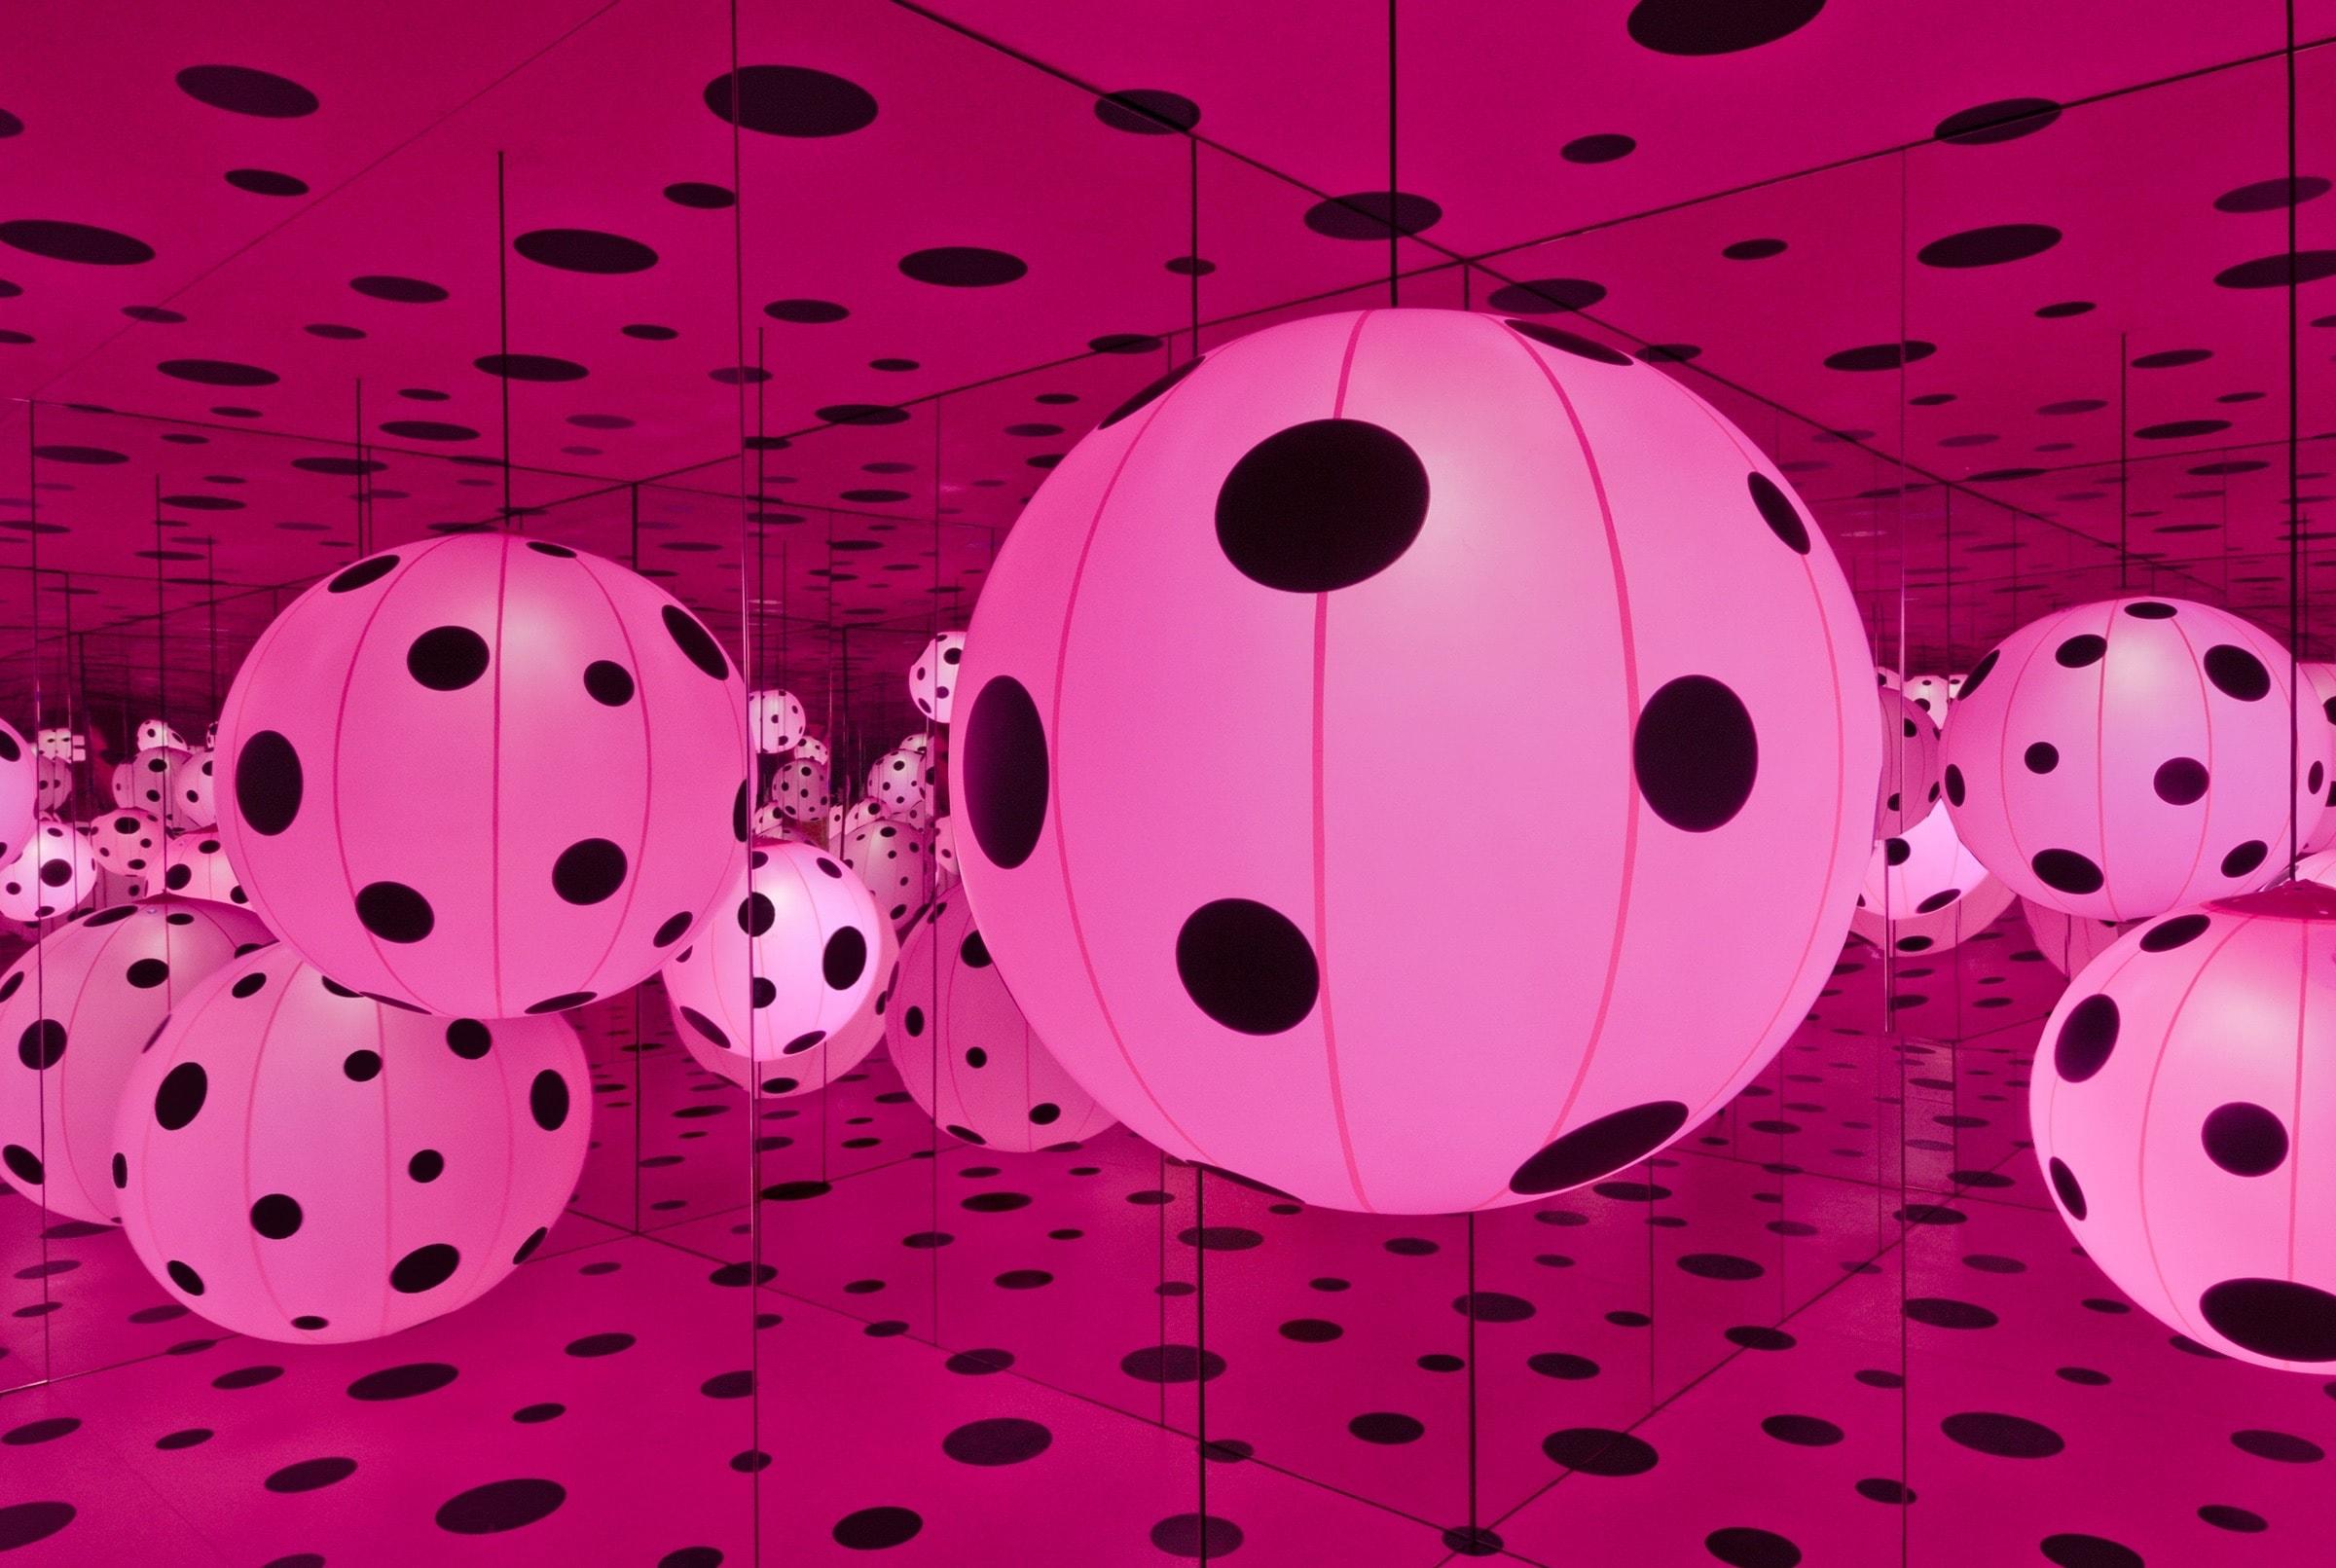 Yayoi Kusama, Dots Obsession – Love Transformed Into Dots, 2007   © Yayoi Kusama/Courtesy of Ota Fine Arts, Tokyo/Singapore; Victoria Miro, London, David Zwirner, New York. Photo by Cathy Carver.